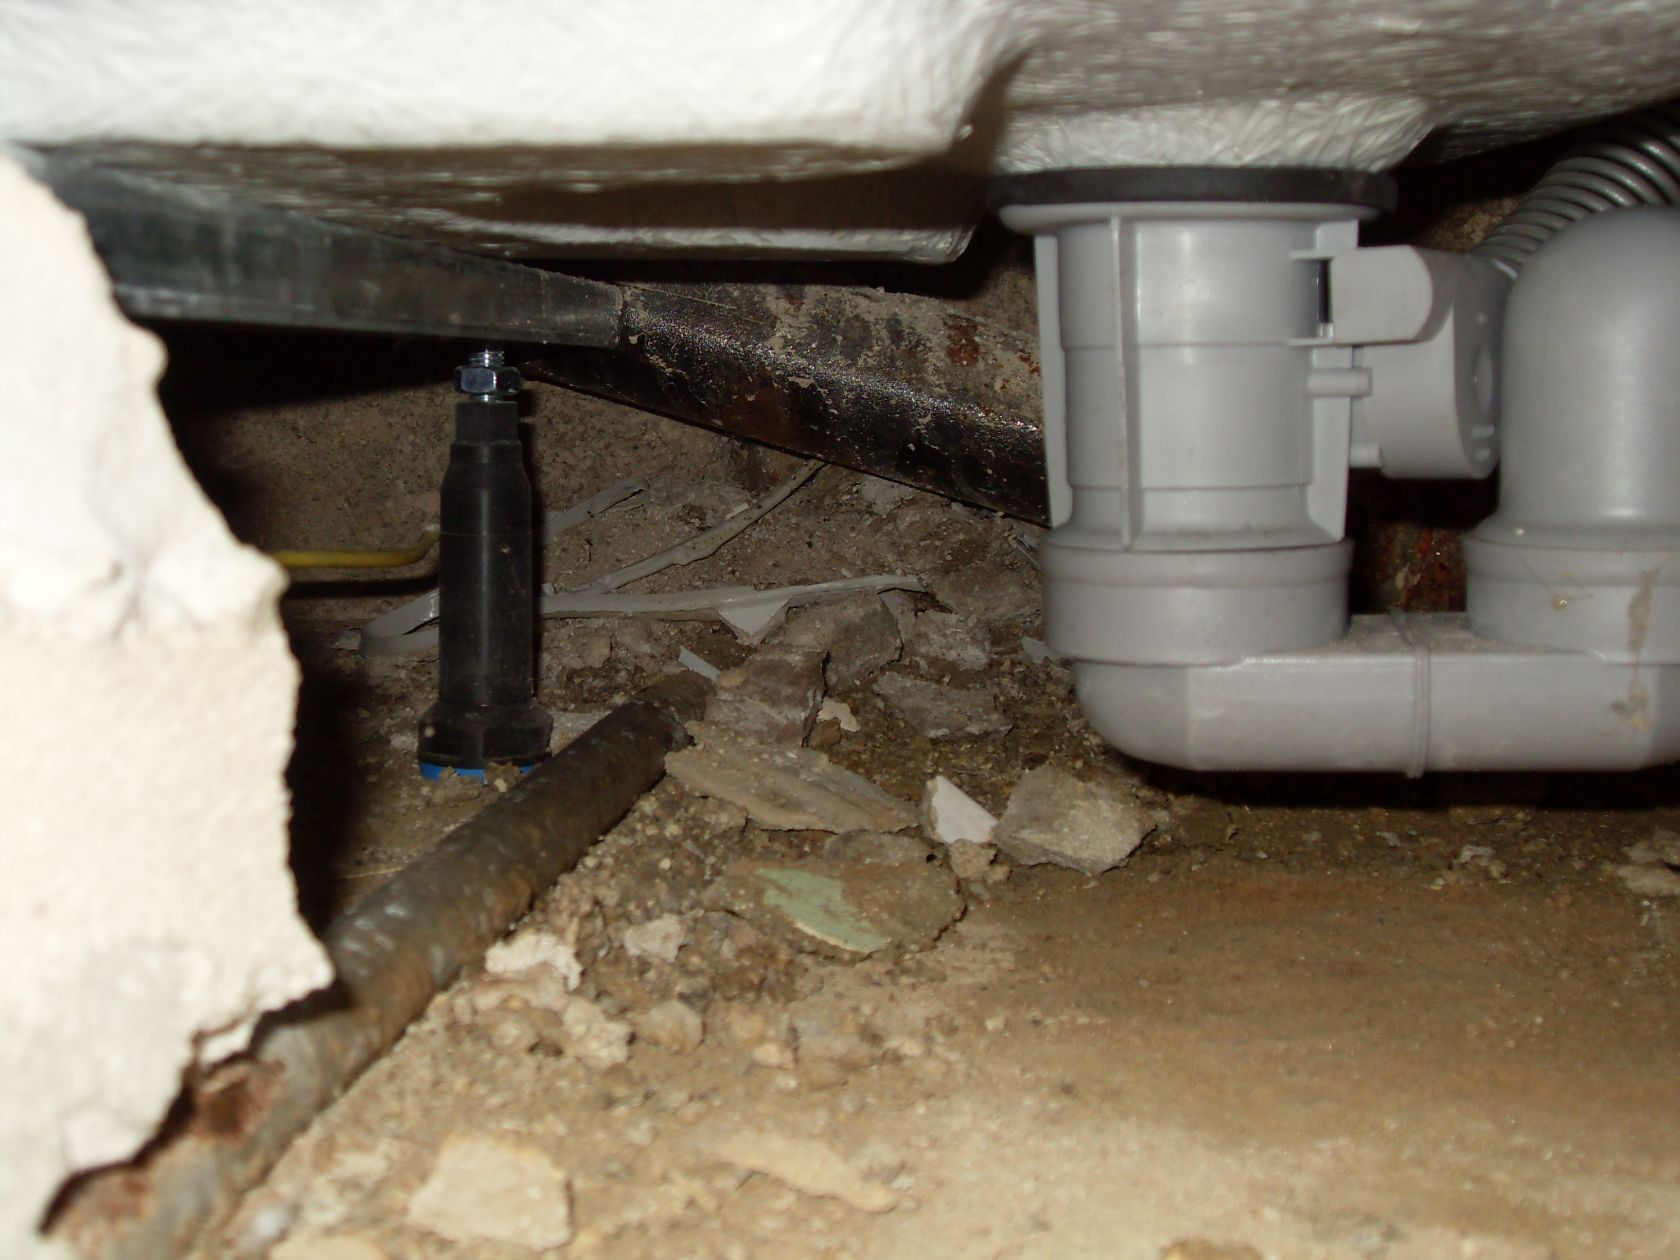 hockenheim defekte abwasserleitung an dusche zum thema. Black Bedroom Furniture Sets. Home Design Ideas